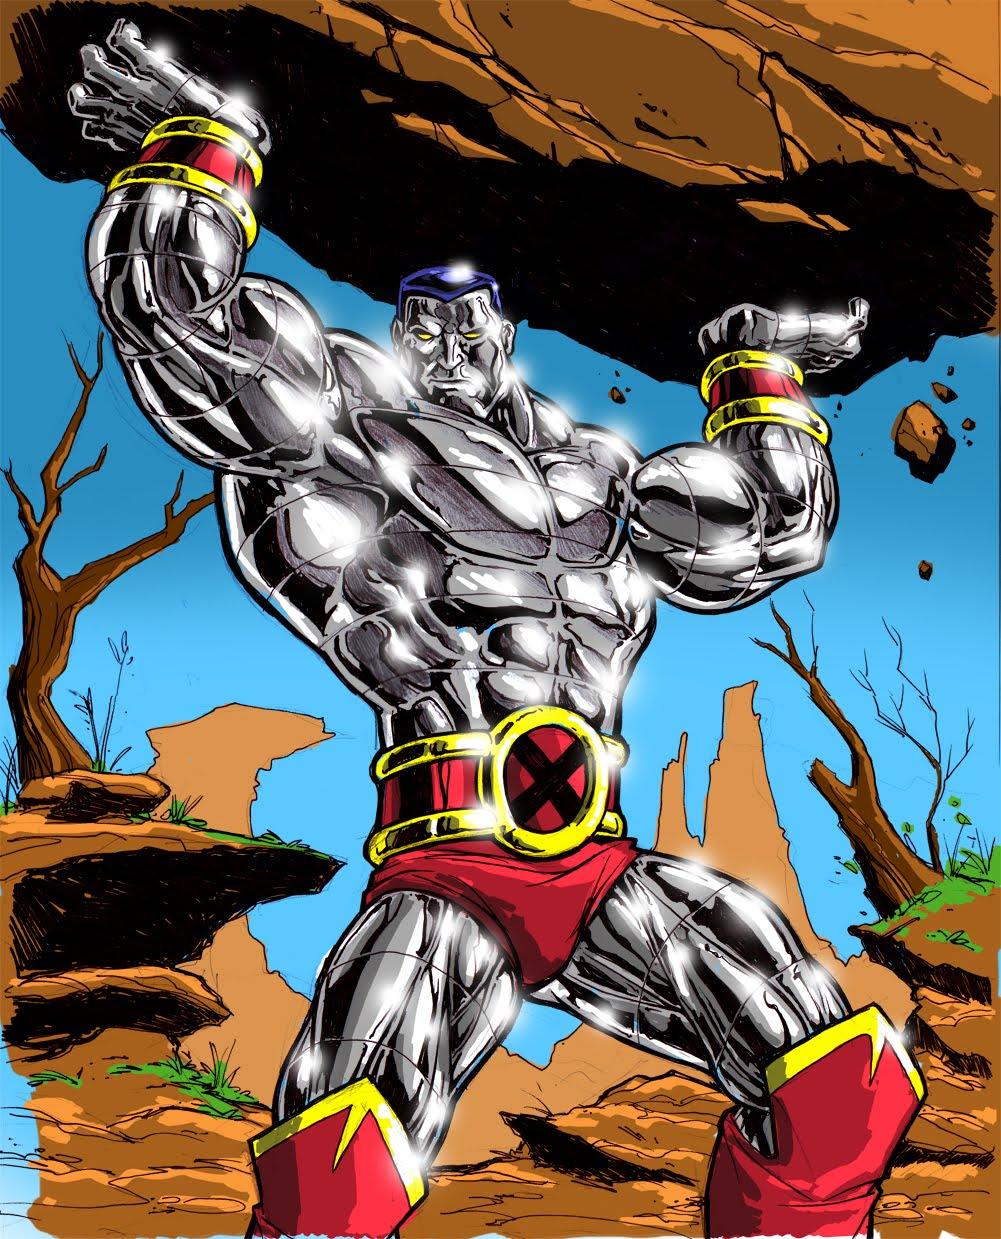 colossus marvel x men - photo #46